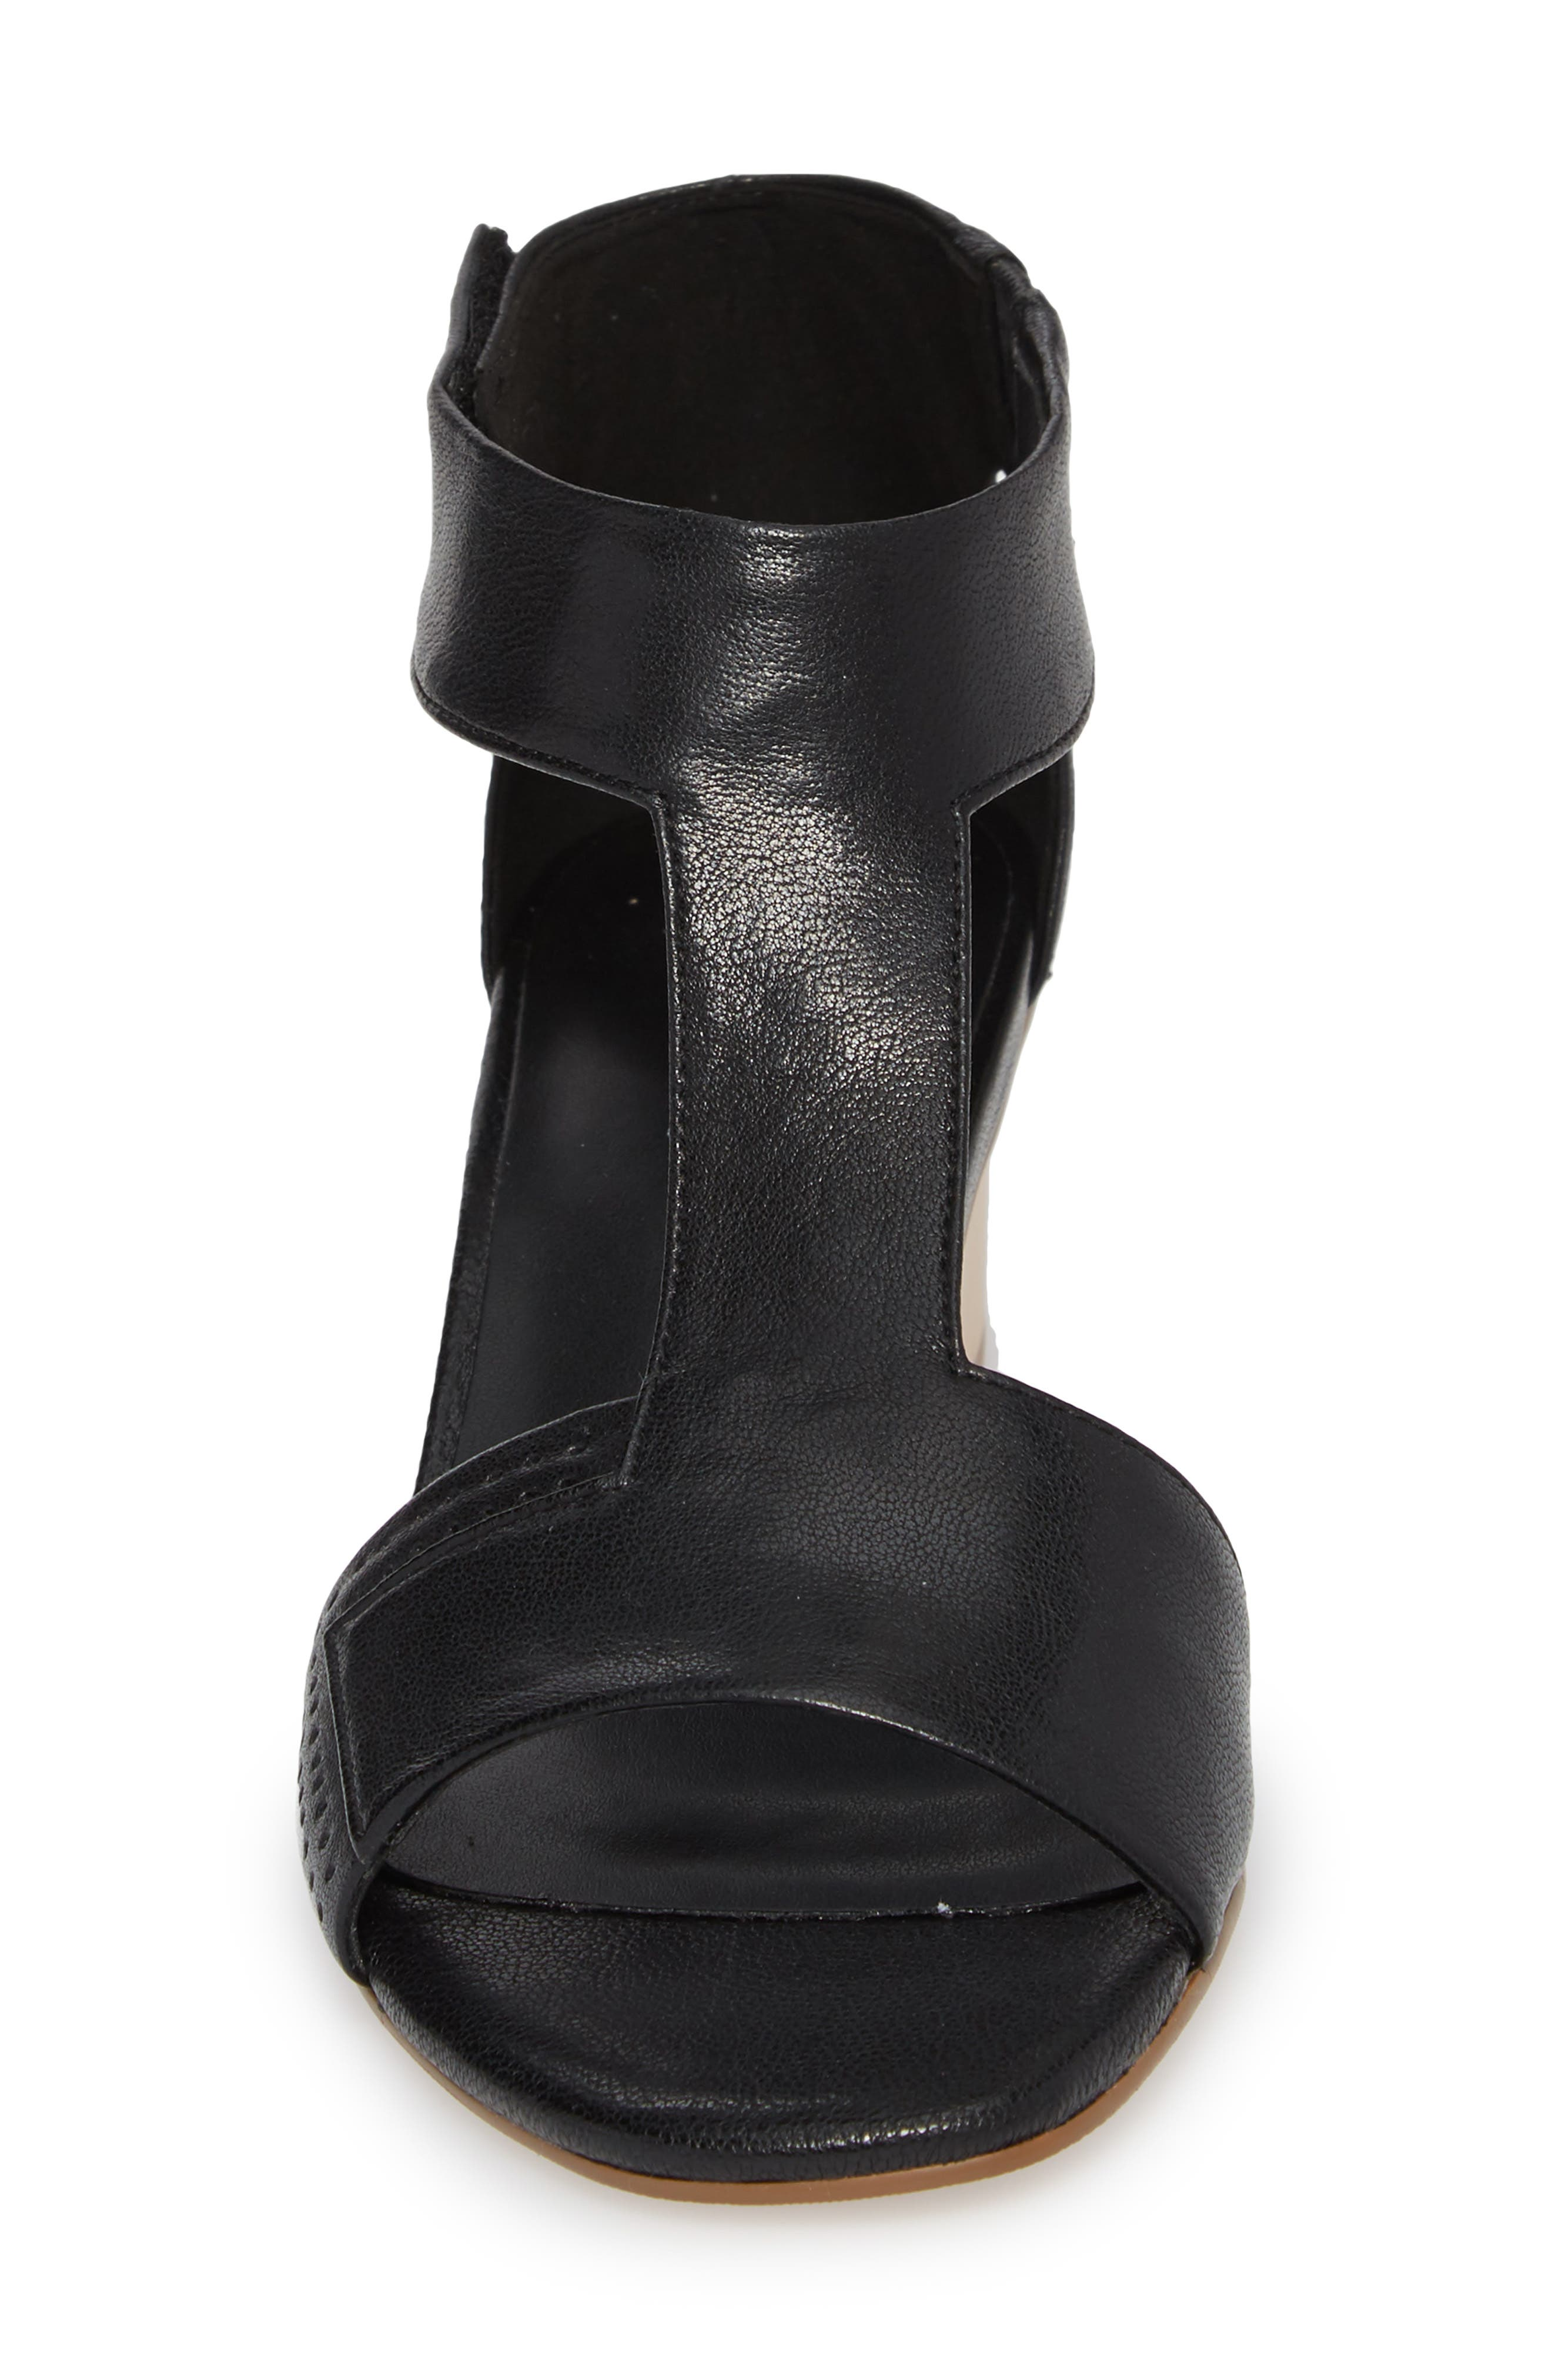 Calyx Block Heel Sandal,                             Alternate thumbnail 4, color,                             BLACK LEATHER